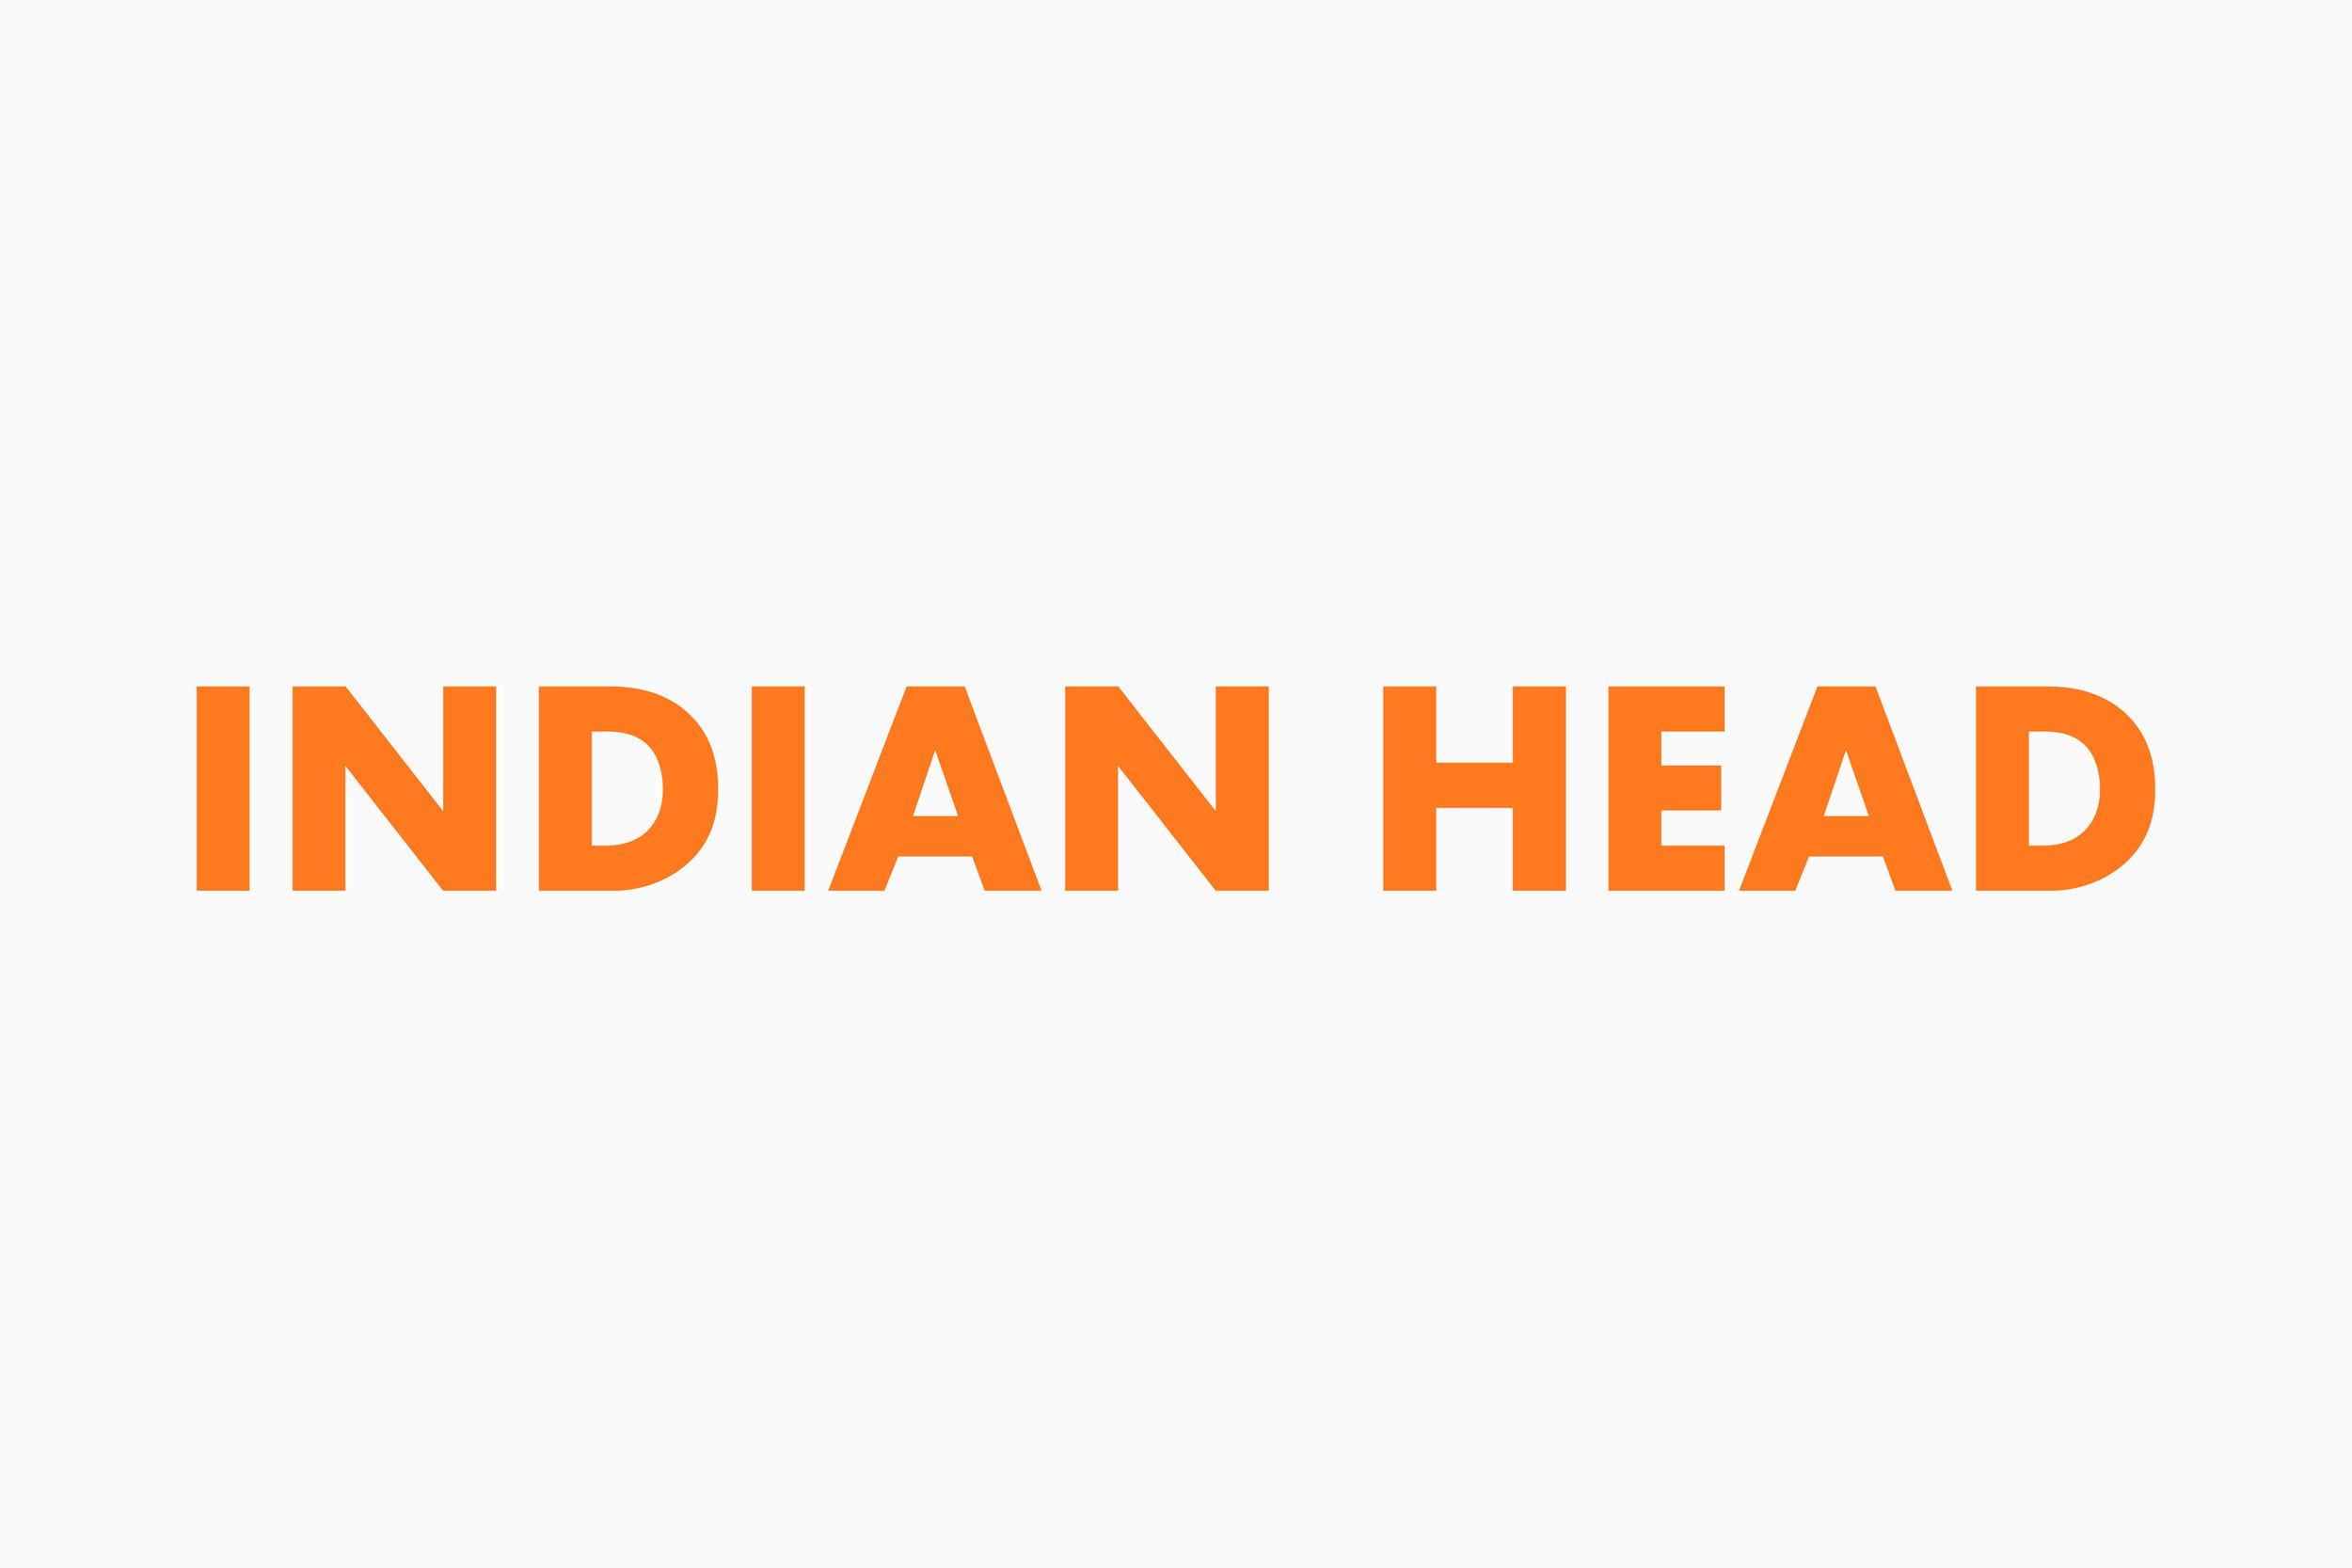 indian_head.jpg